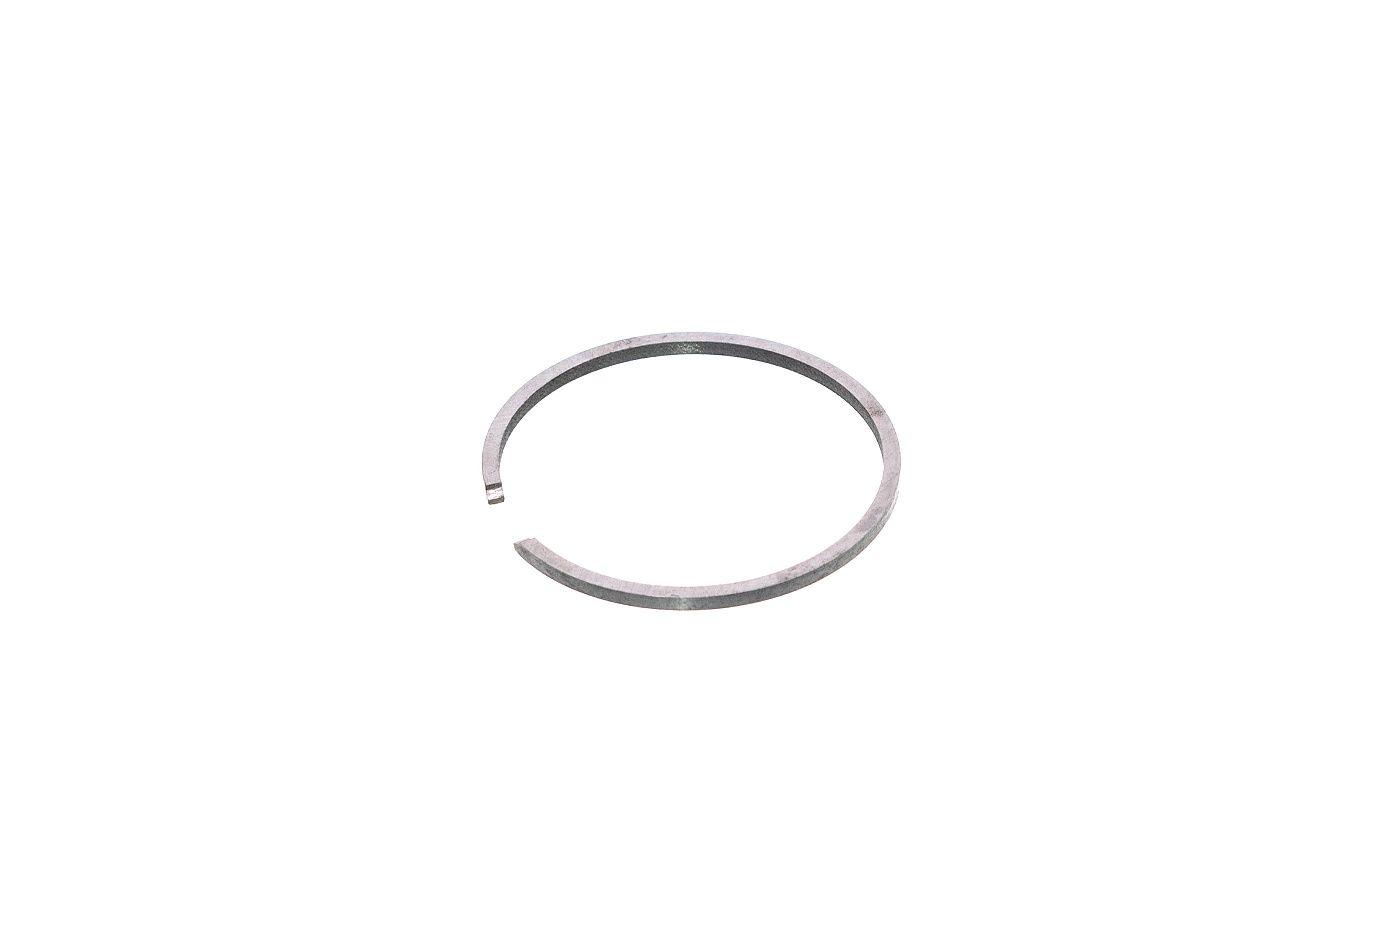 Piestný krúžok 34 x 1,5 mm